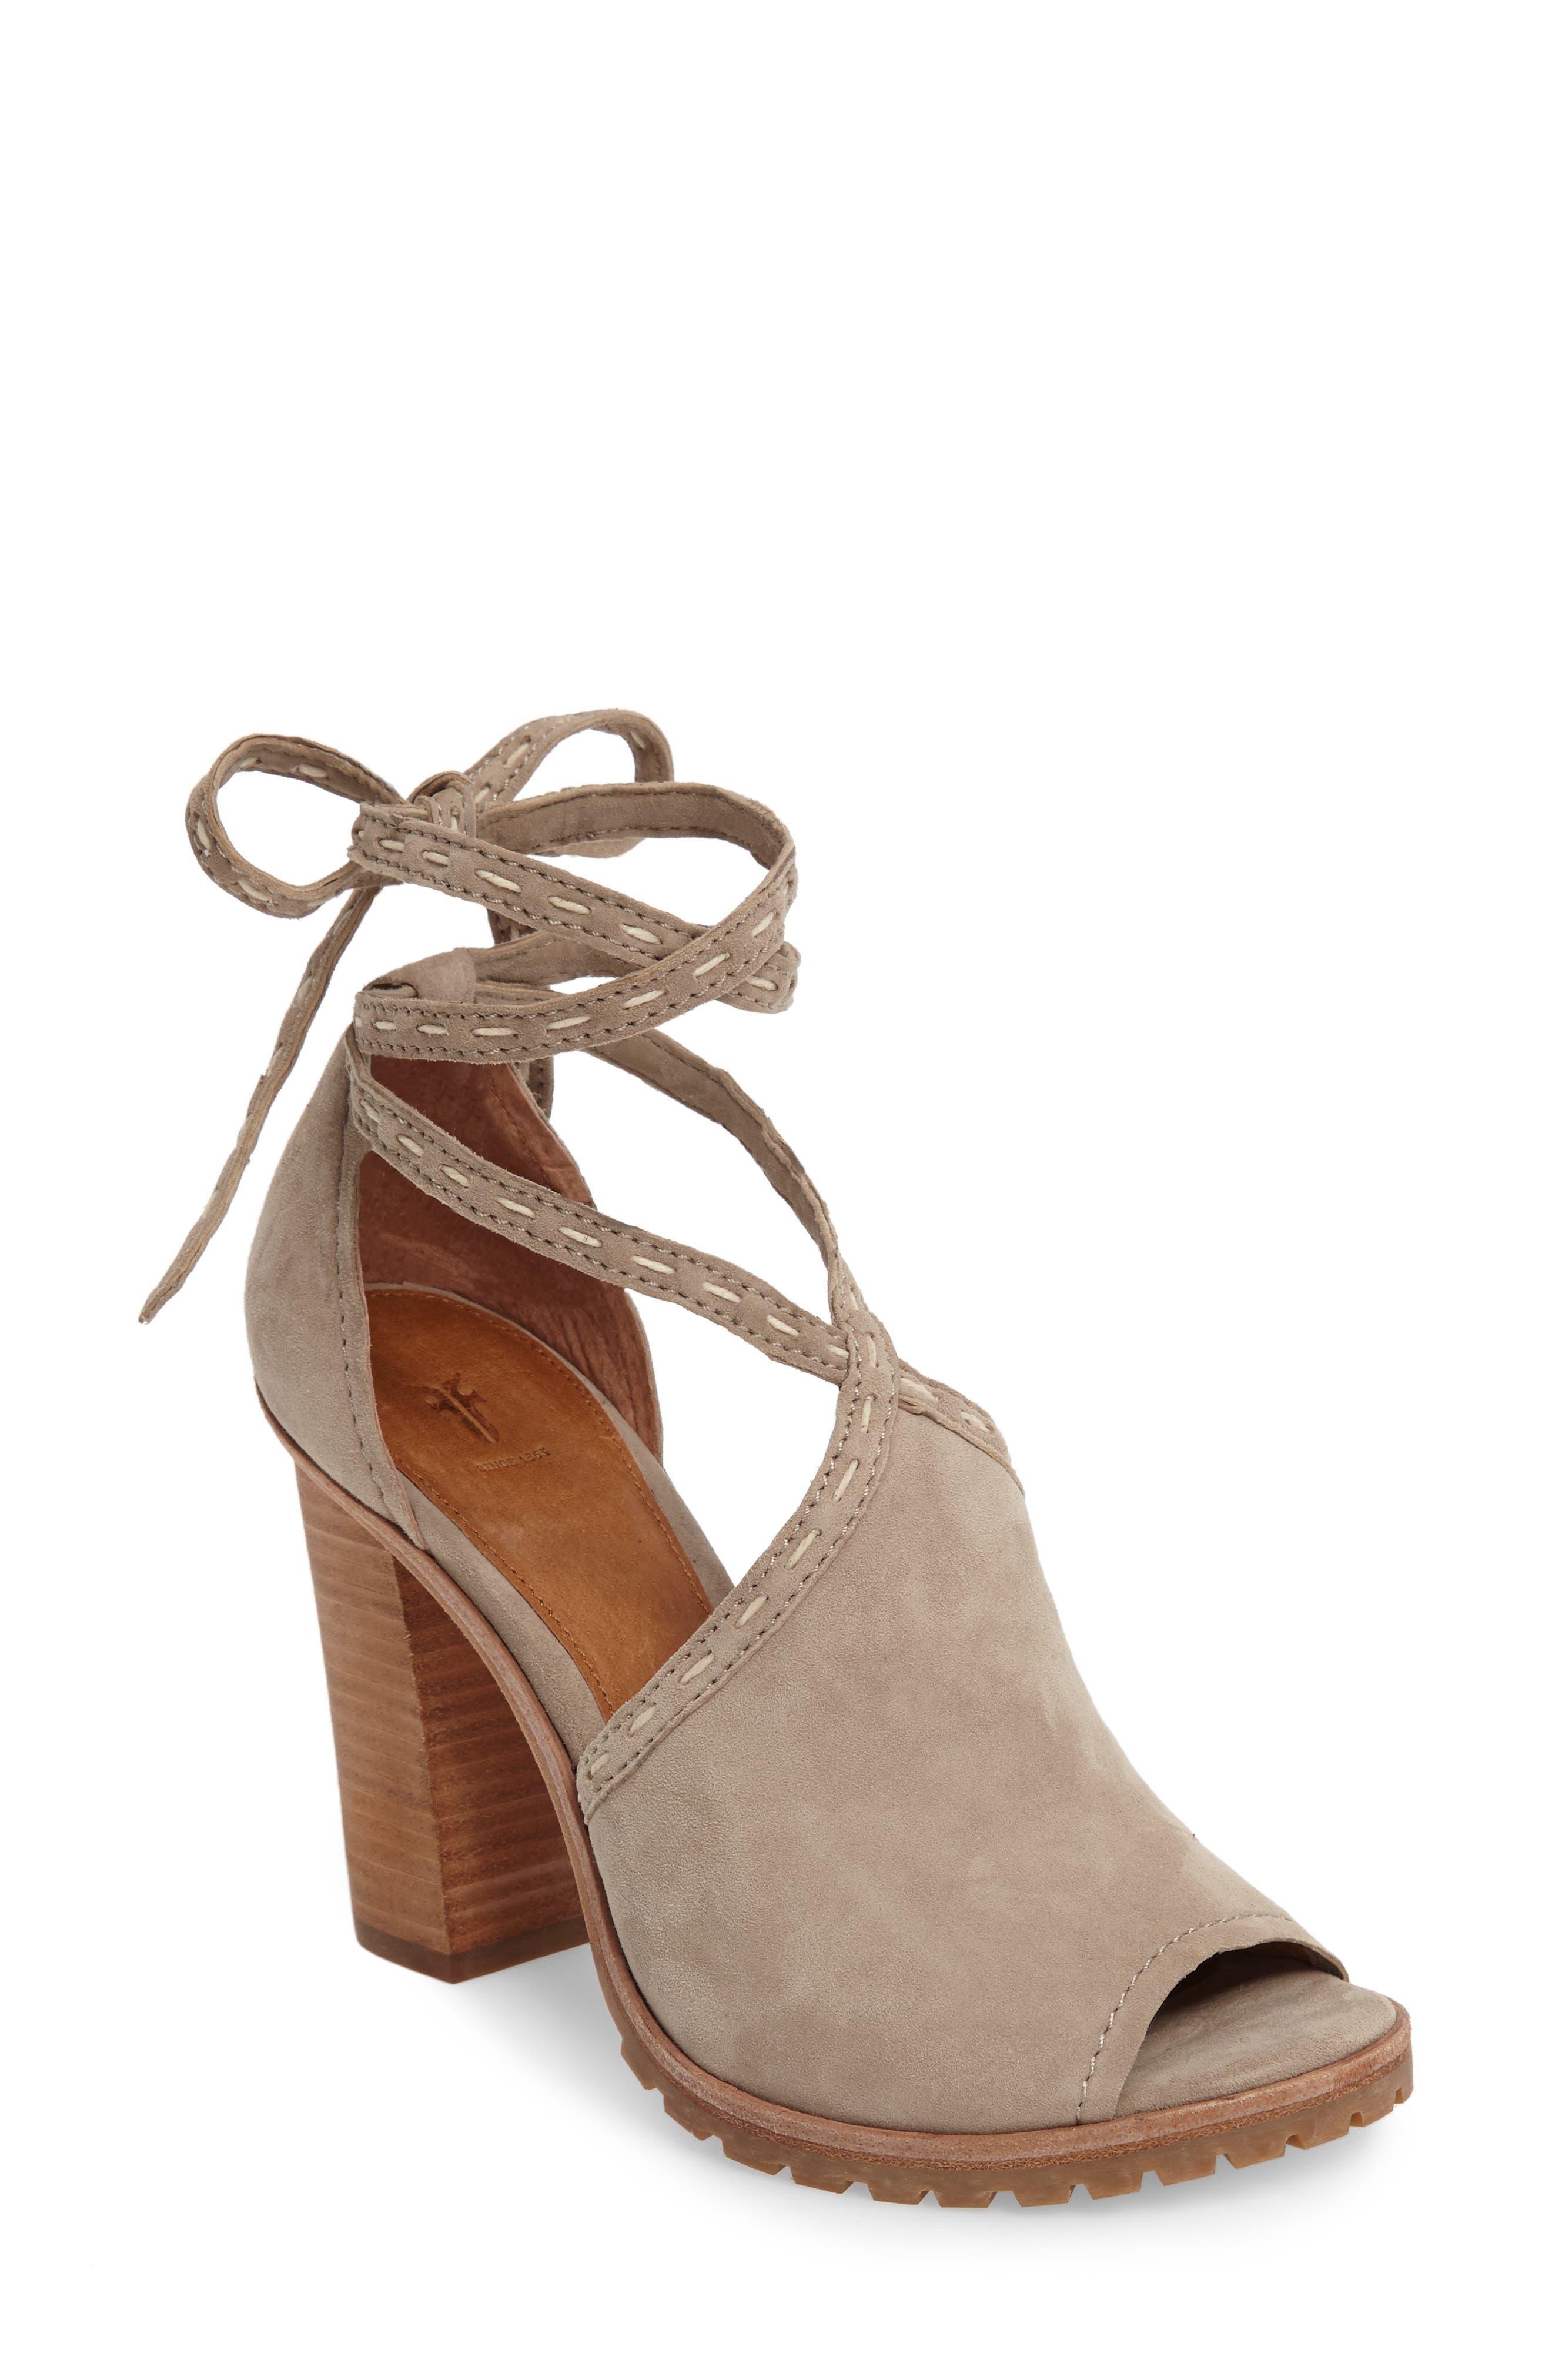 Main Image - Frye Suzie Wraparound Sandal (Women)